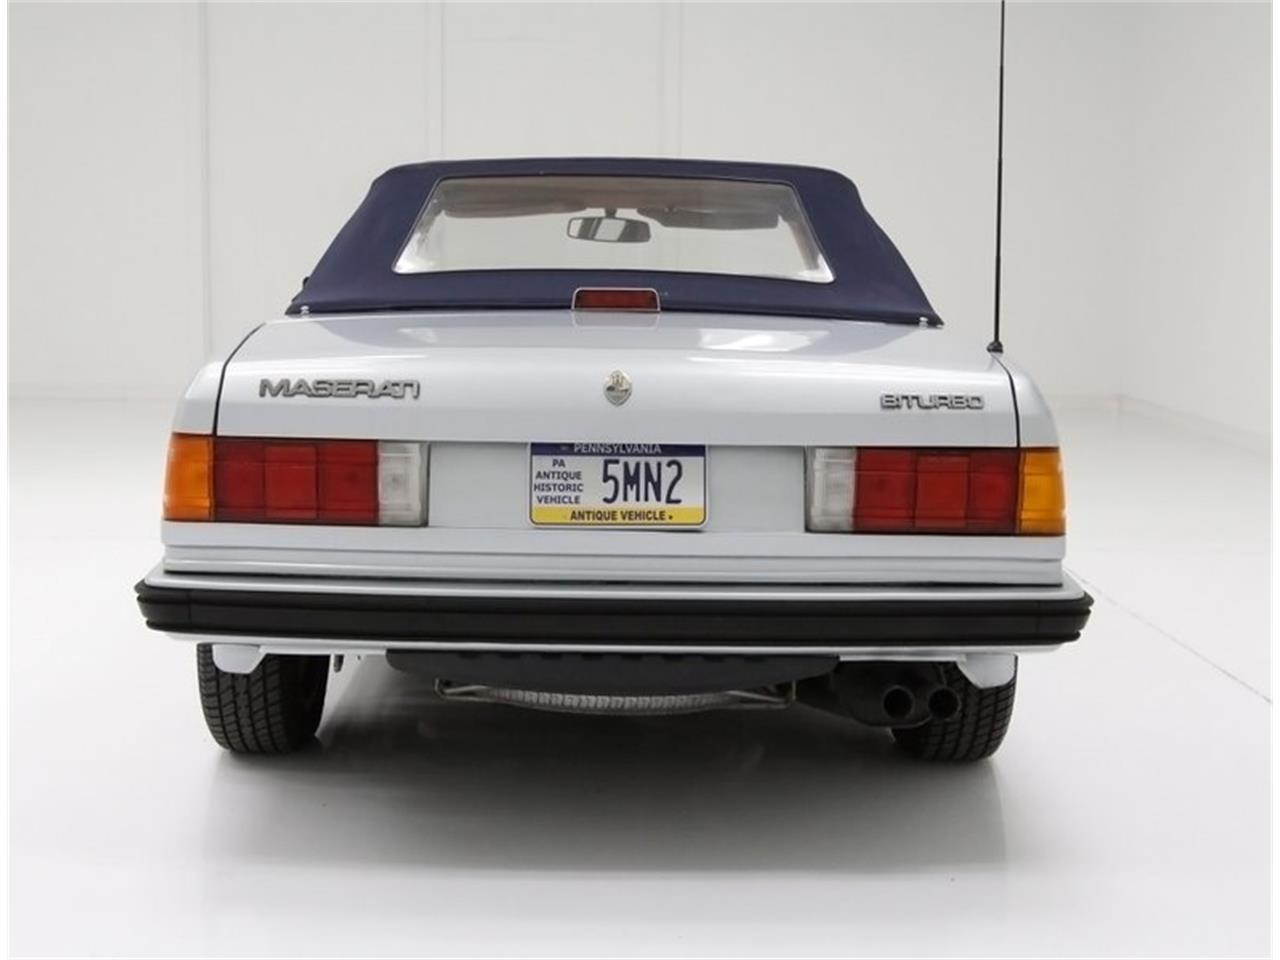 1986 Maserati Biturbo for sale in Morgantown, PA ...